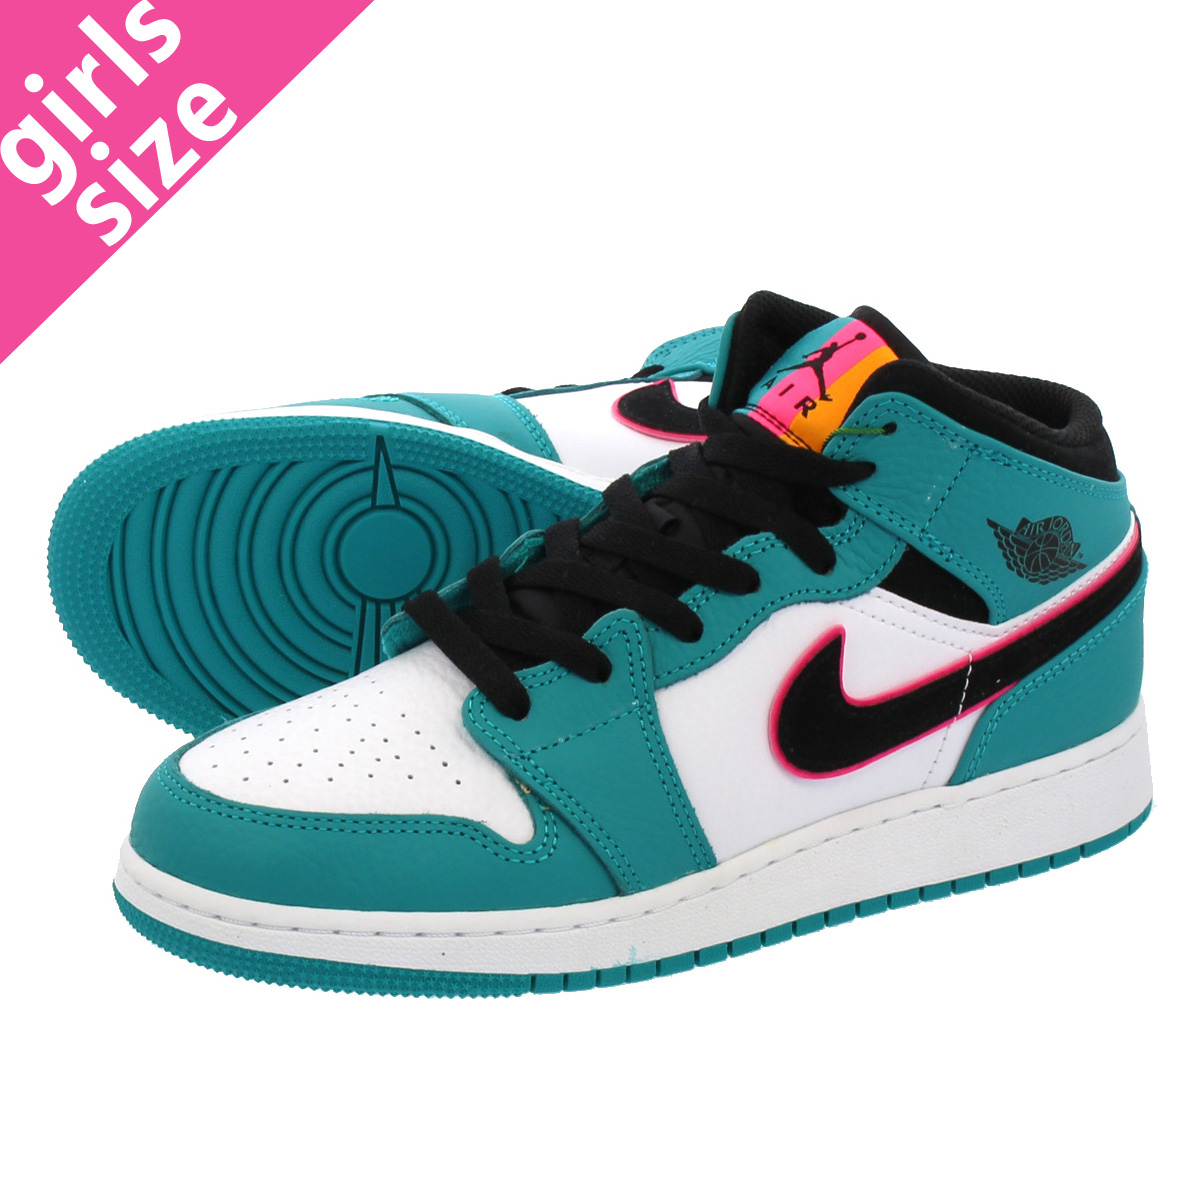 low priced 03bfc 8b831 NIKE AIR JORDAN 1 MID BG Nike Air Jordan 1 mid BG TURBO GREEN BLACK HYPER  PINK ORANGE PEEL bq6931-306